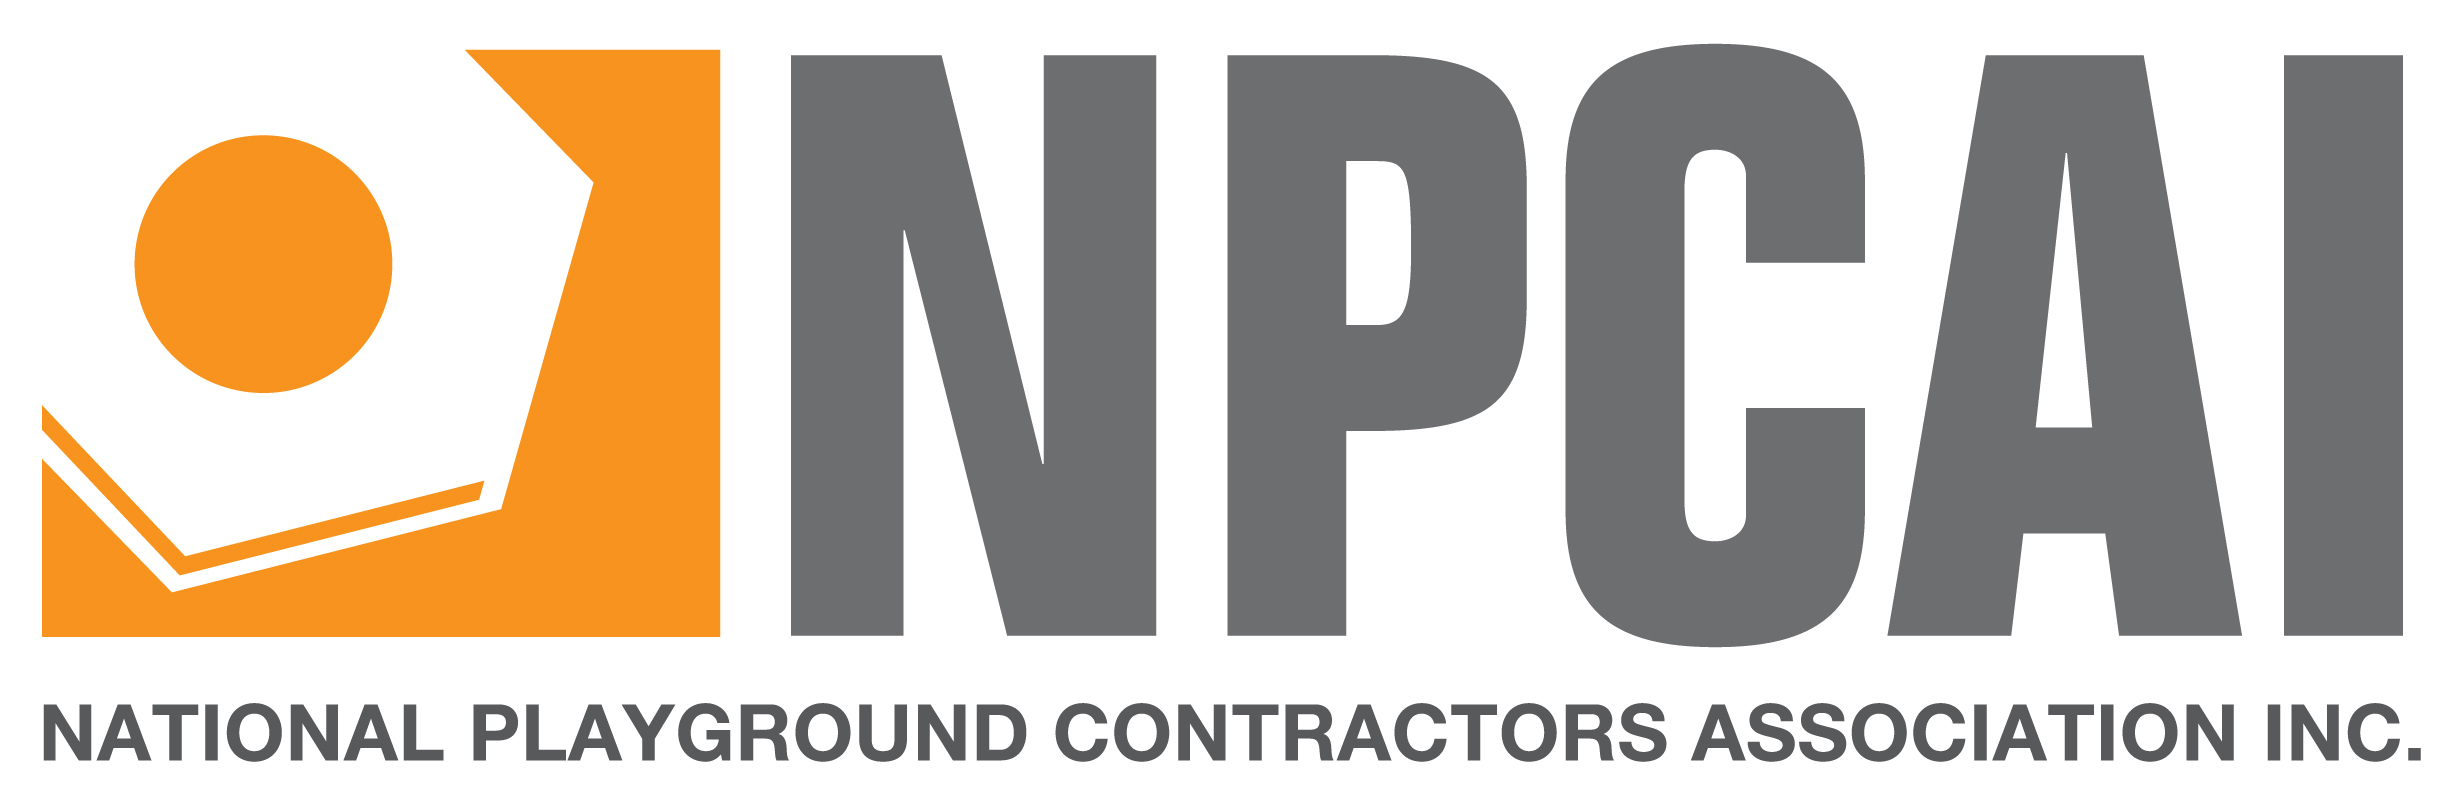 NPCAI_Logo2019_1500x490.jpg